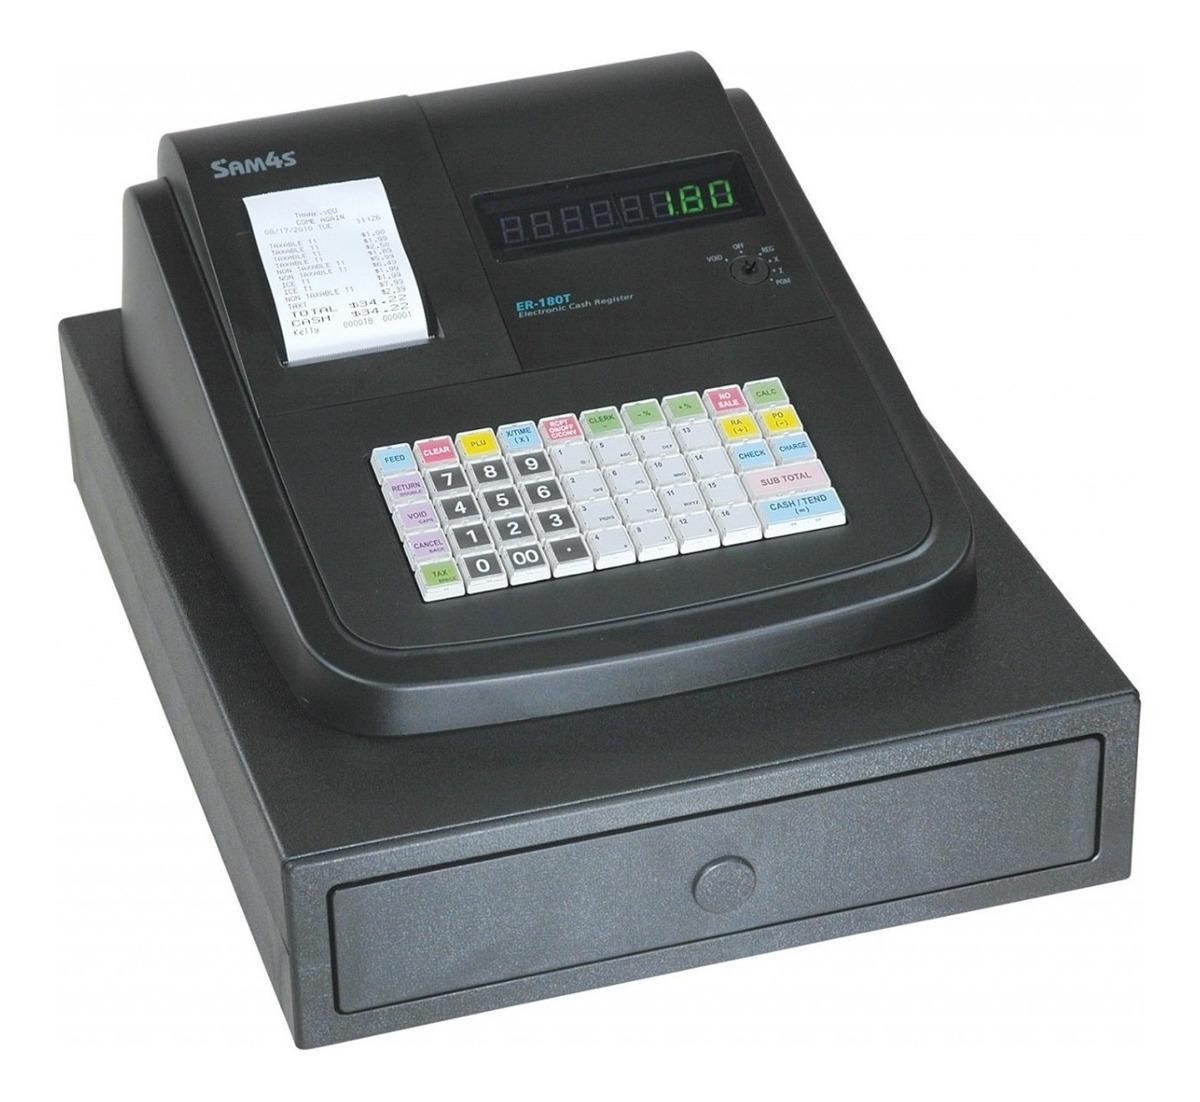 Caja Registradora Sam4s Er-180u (rz Chile) - $ 225.000 en Mercado ...